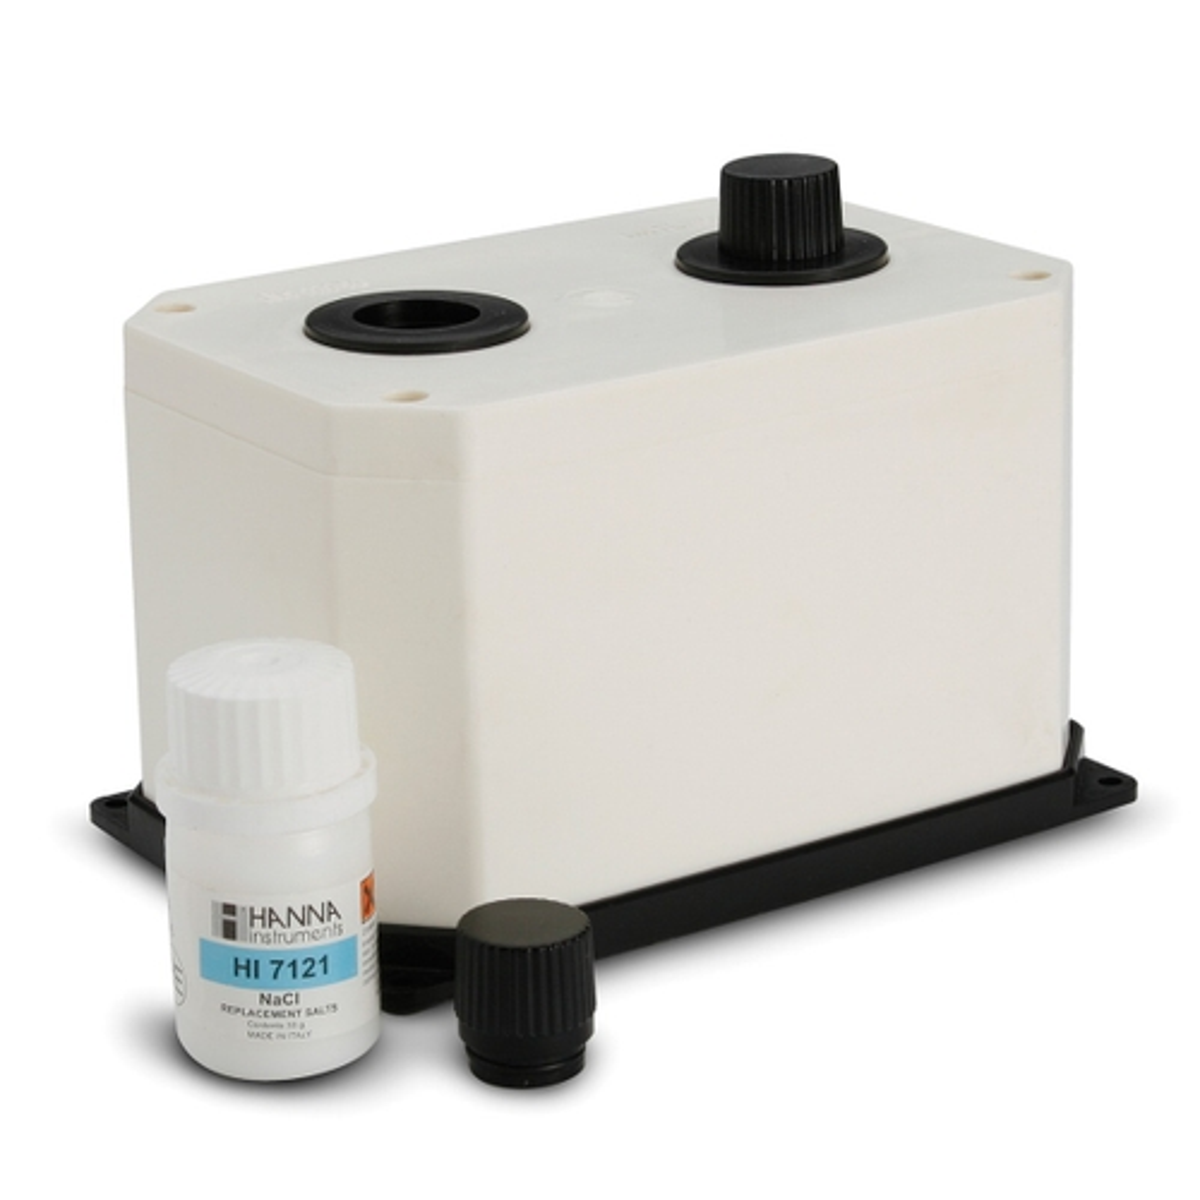 Calibration Kit for Relative Humidity - HI7102